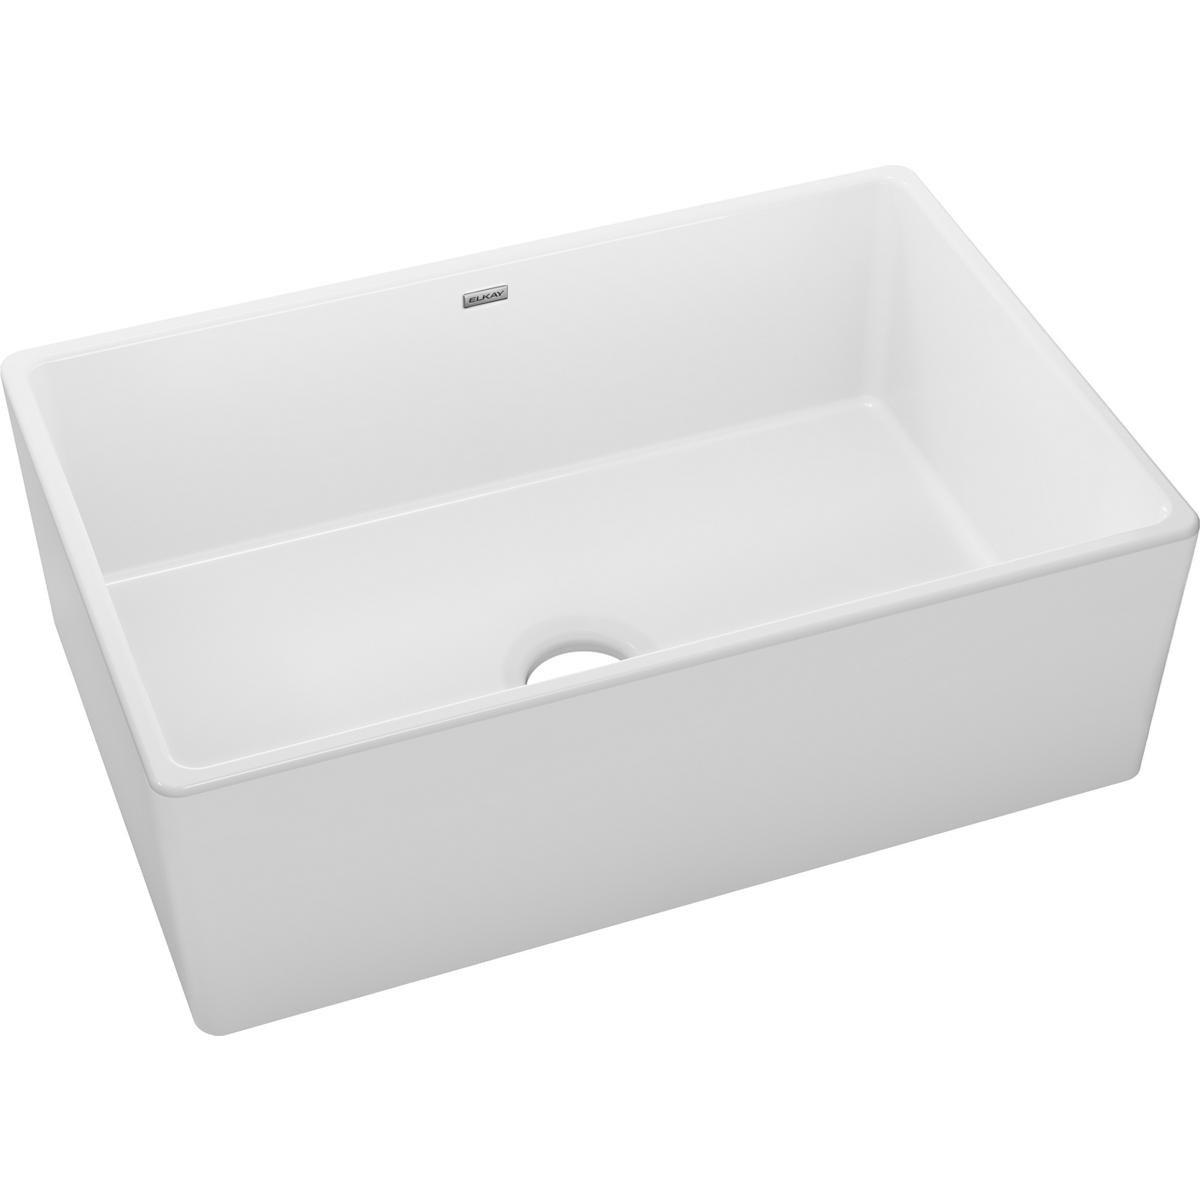 Elkay Mfg Co Explore Deep Single Bowl Apron Sink White